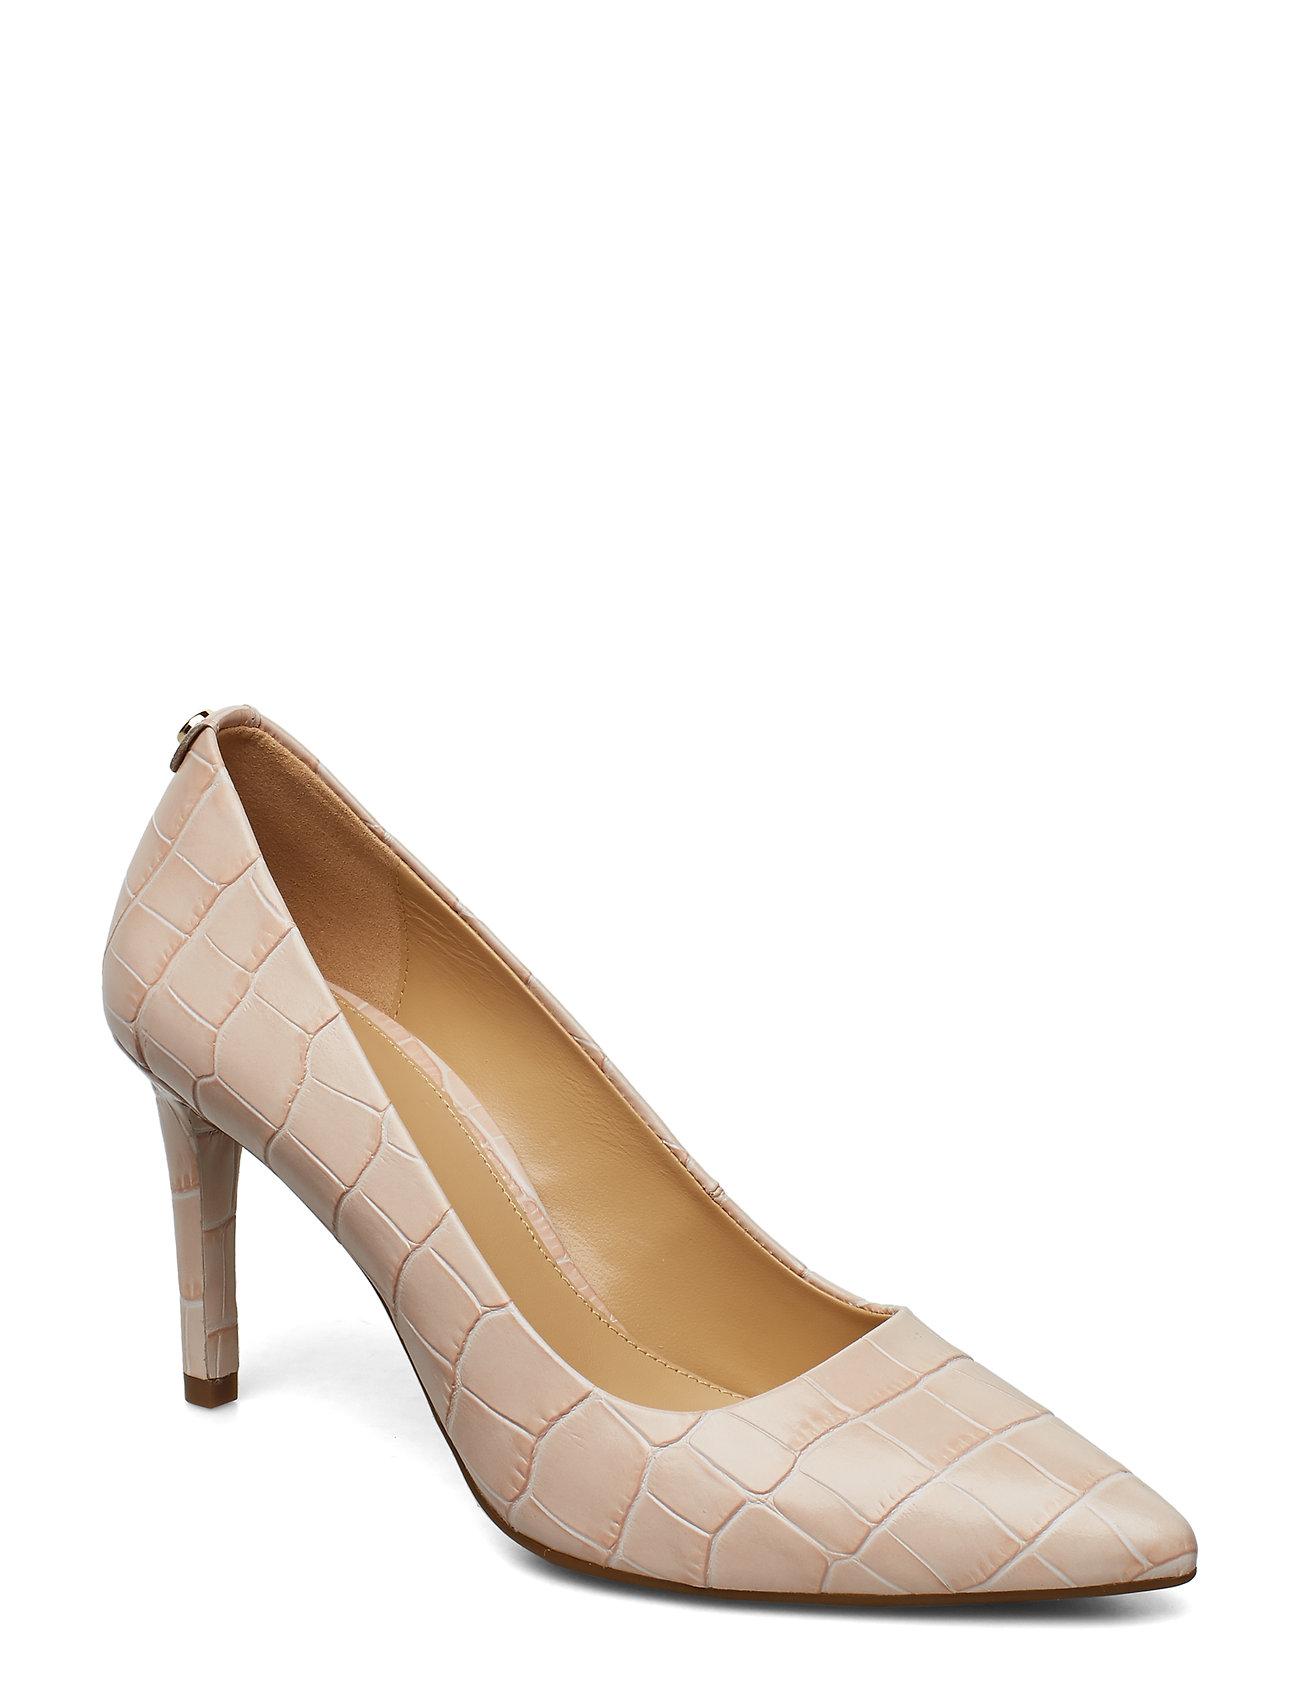 Michael Kors Shoes DOROTHY FLEX PUMP - SOFT PINK